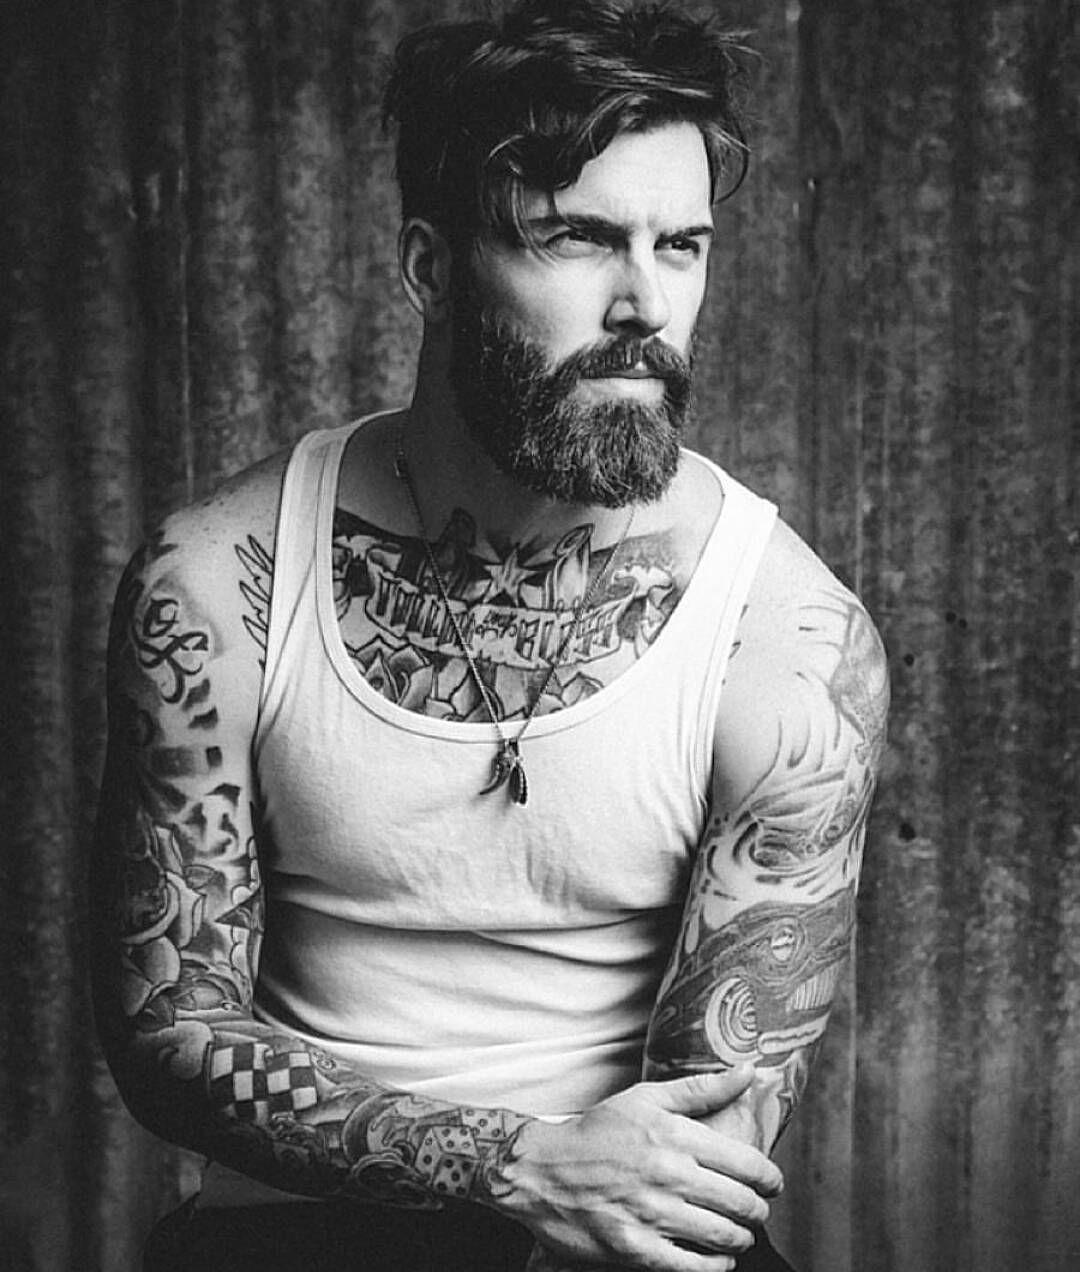 nasa guy with tattoos - HD799×1200